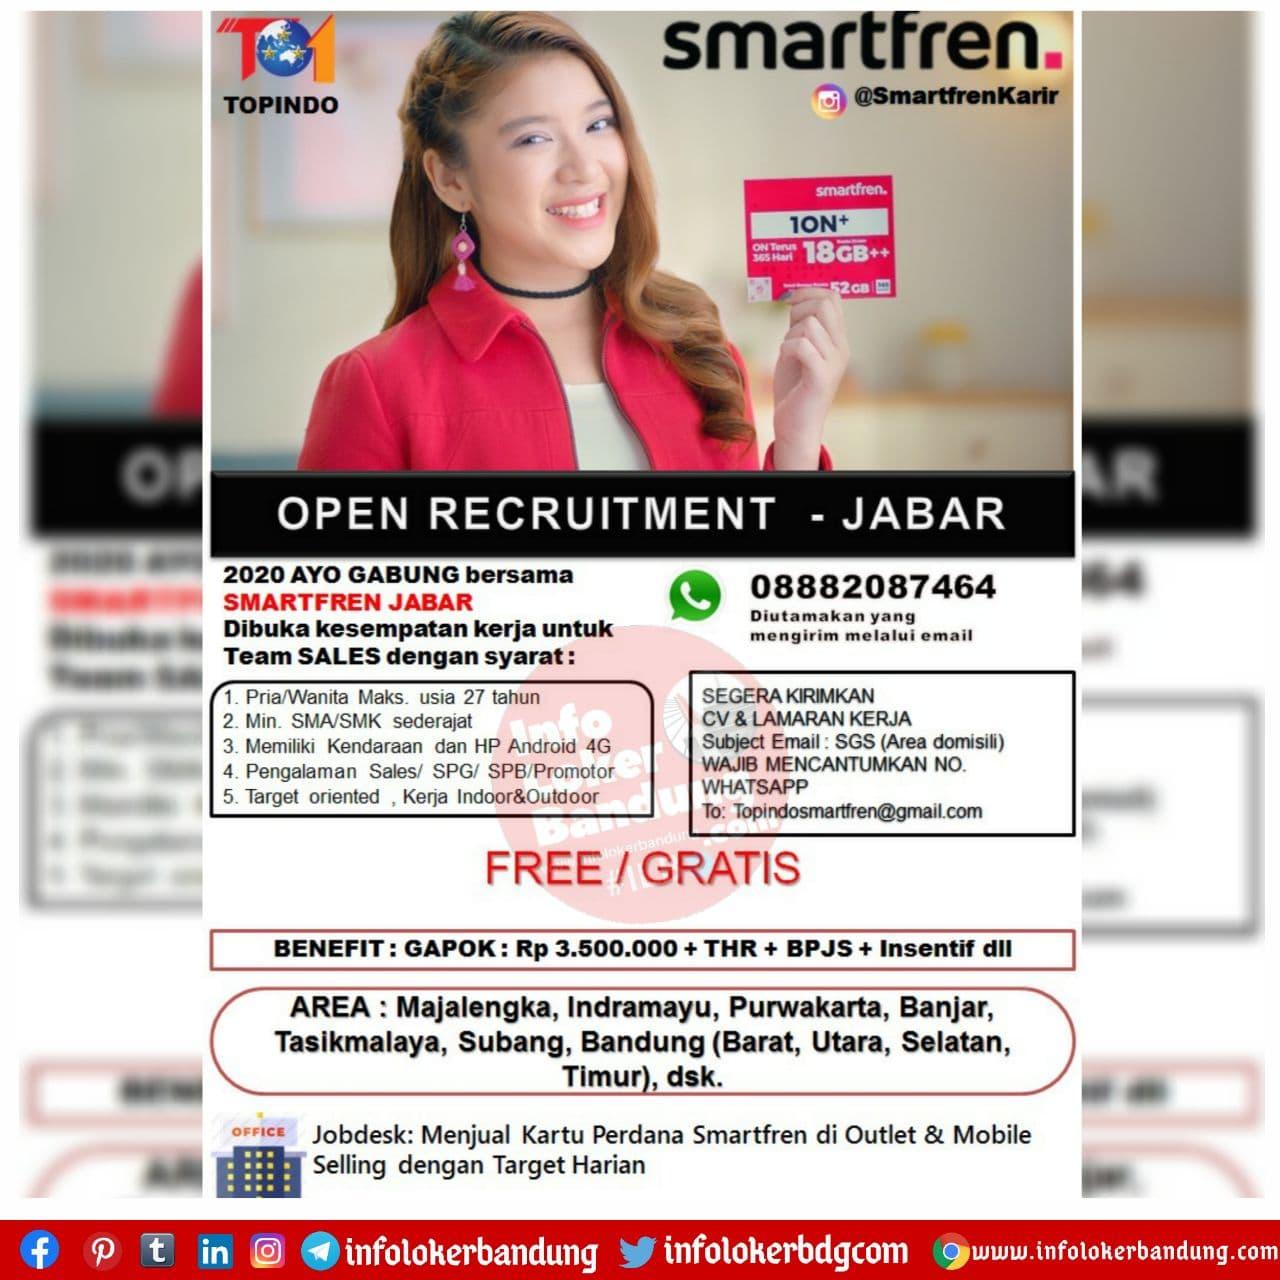 Lowongan Kerja Smartfren ( Topindo ) Bandung November 2020